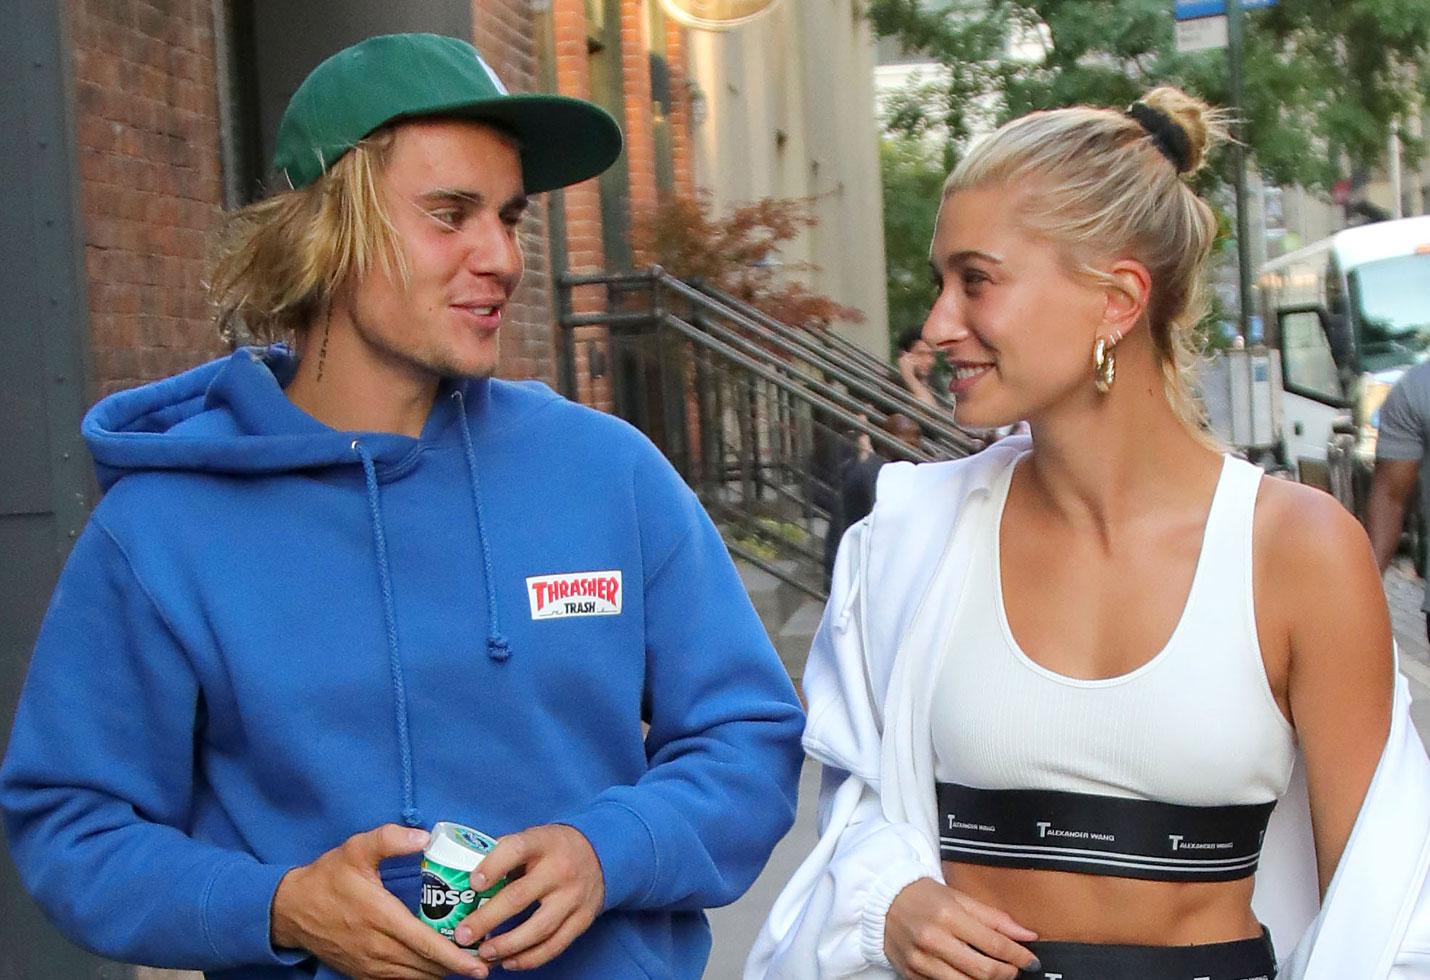 -PICTURED: Justin Bieber, Hailey Baldwin